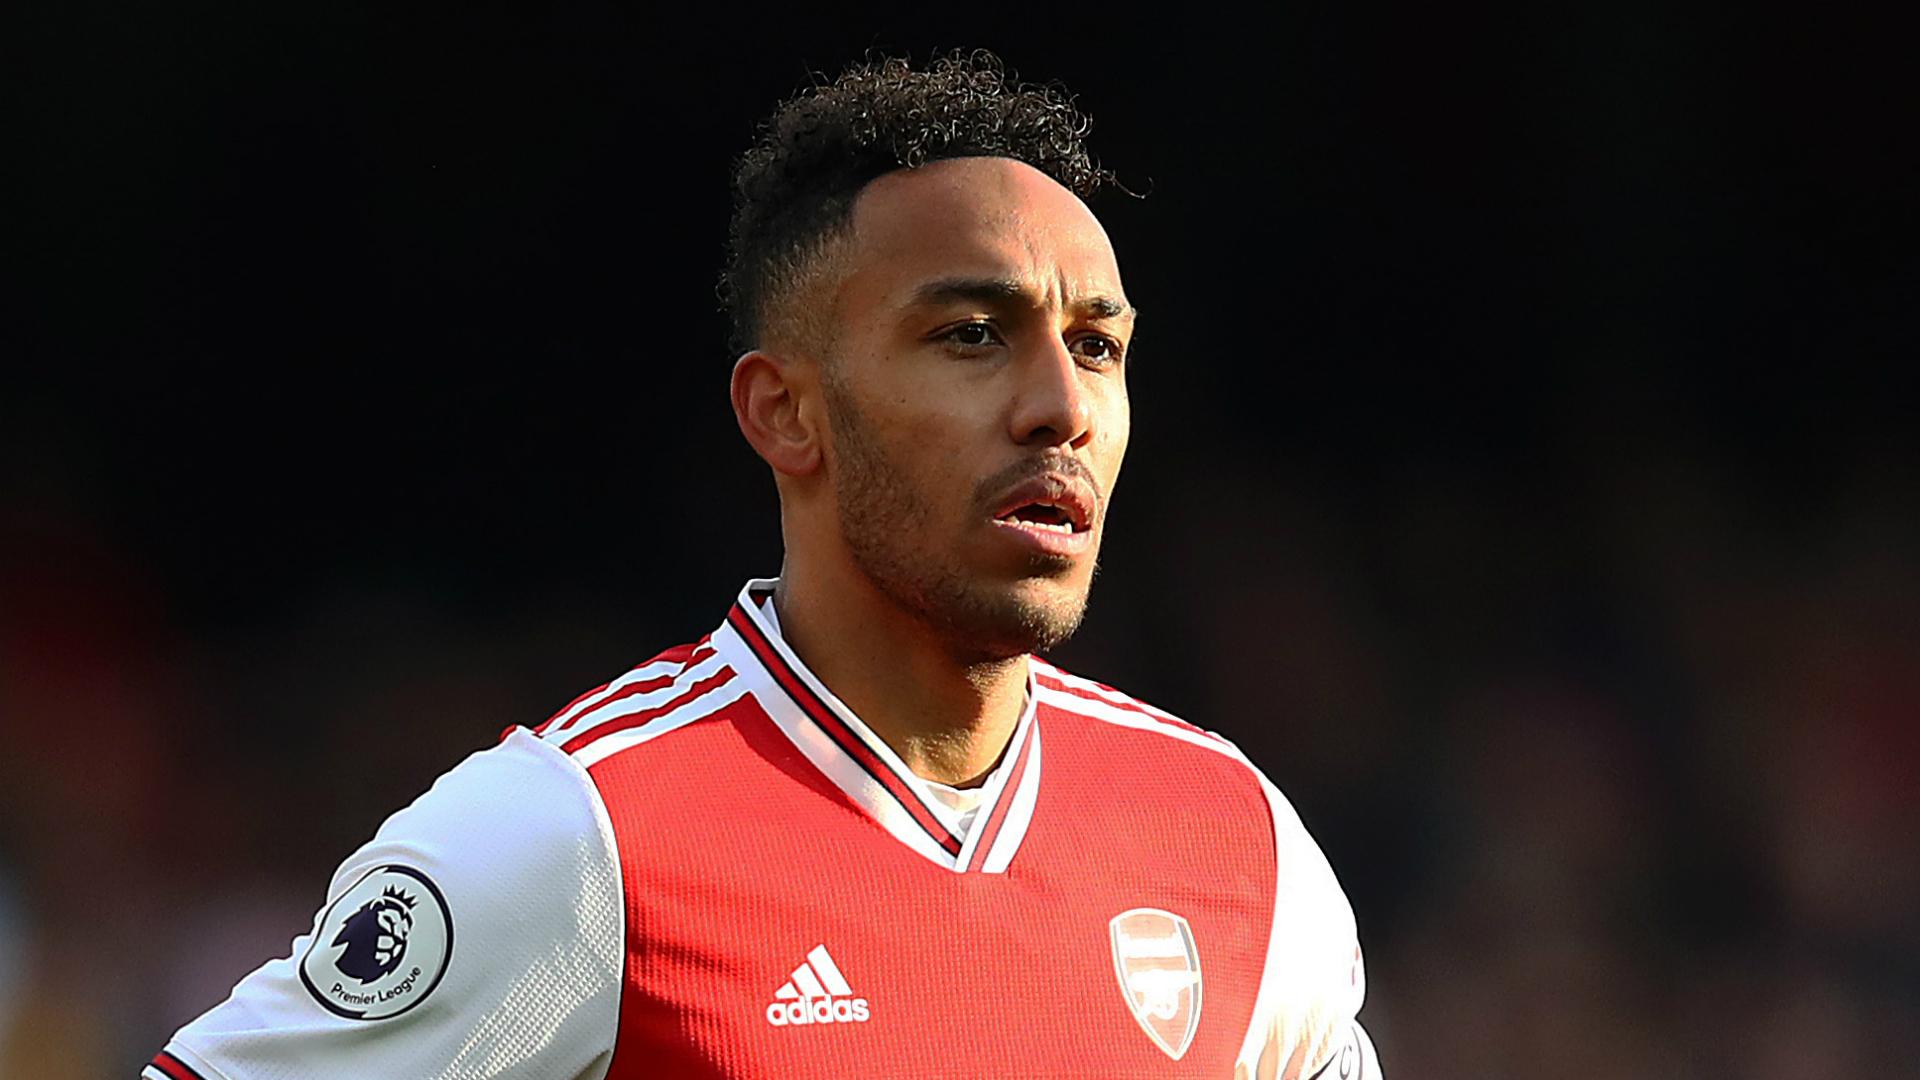 I want him here - Arteta not considering Arsenal without Aubameyang